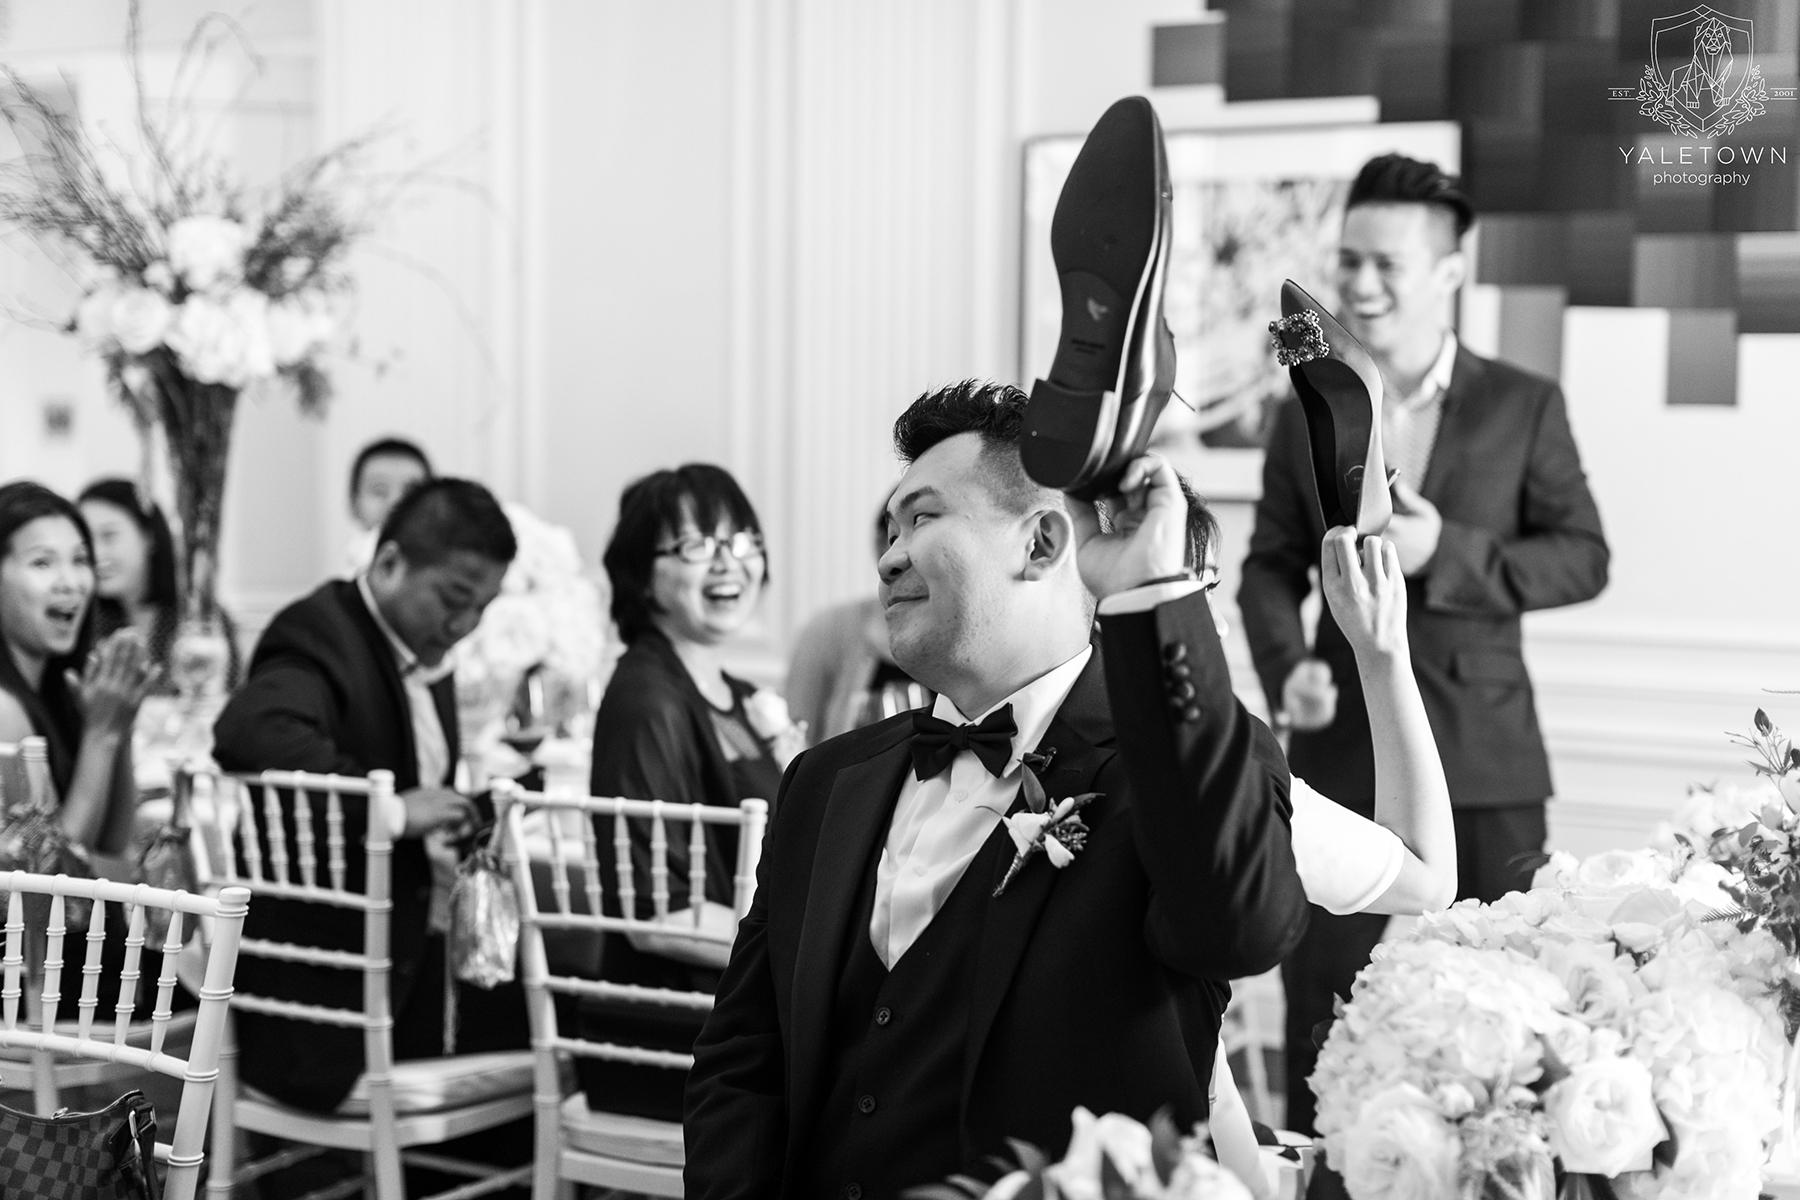 Wedding-Reception-Bride-Groom-Shoe-Game-Rosewood-Hotel-Georgia-Vancouver-Wedding-Yaletown-Photography-photo